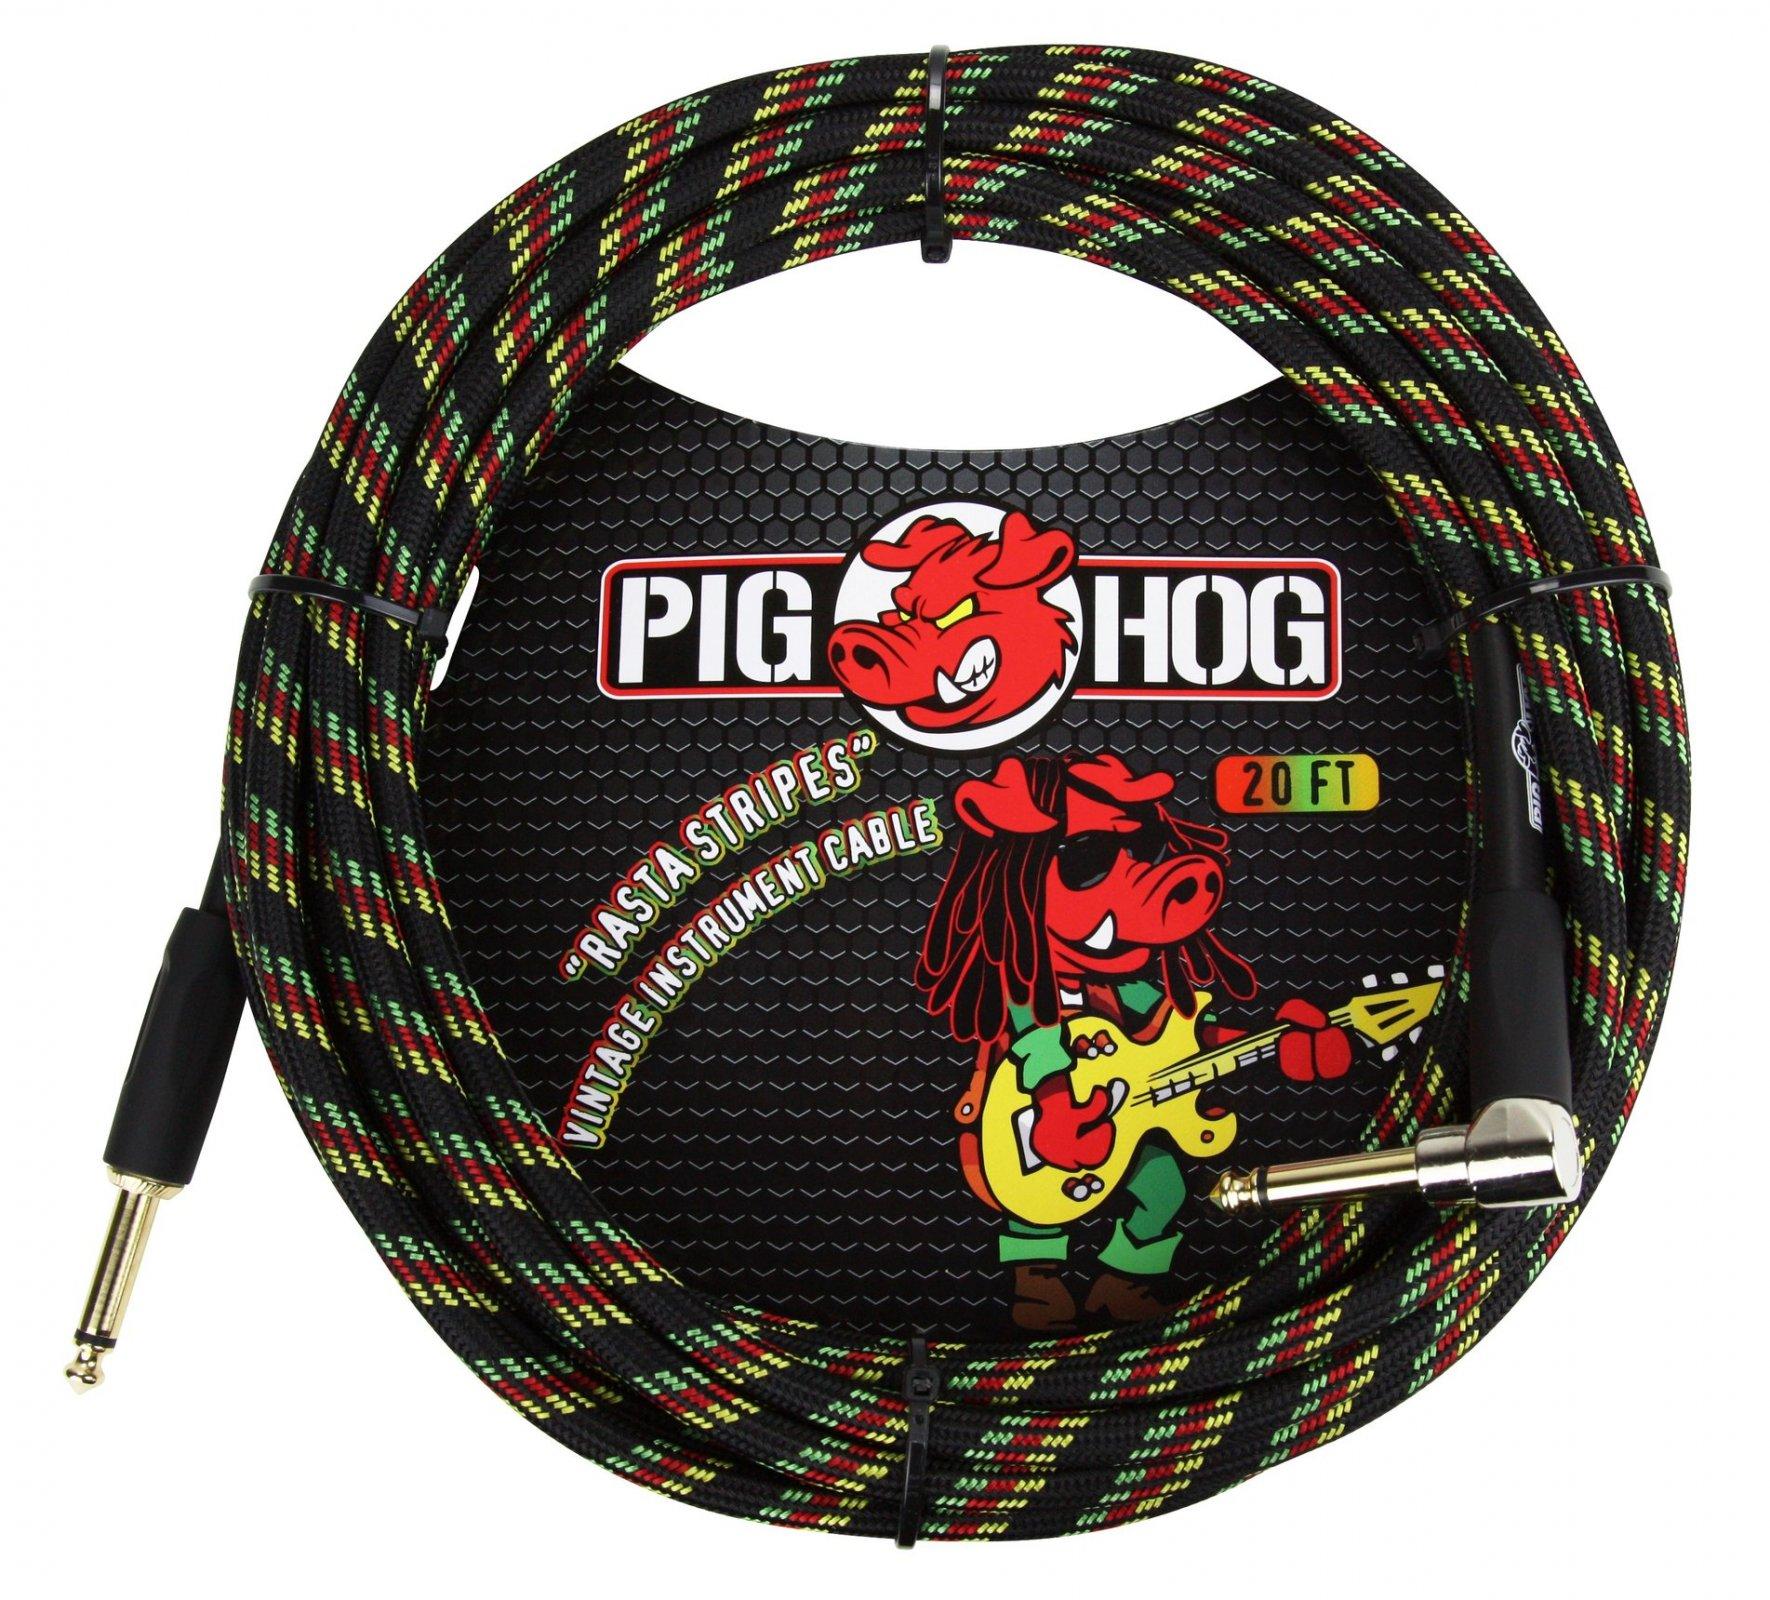 Pig Hog Rasta Stripes 20ft instrument cable right angle